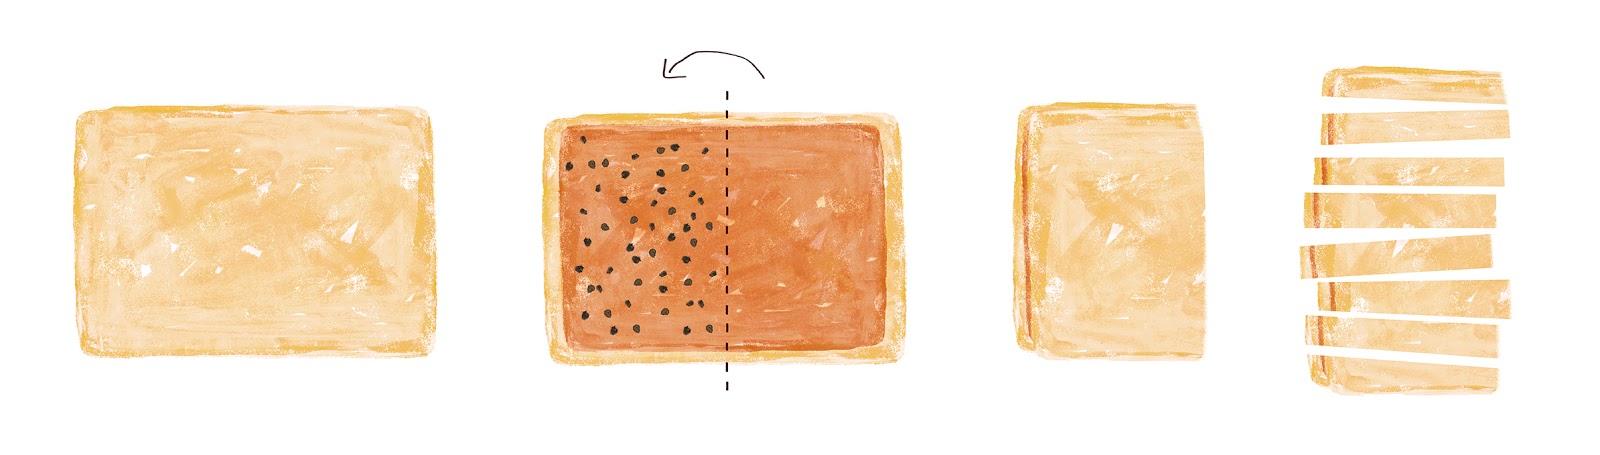 Swedish cinnamon rolls, raisins, breakfast, Minty's Table, Lauren Monaco Illustration